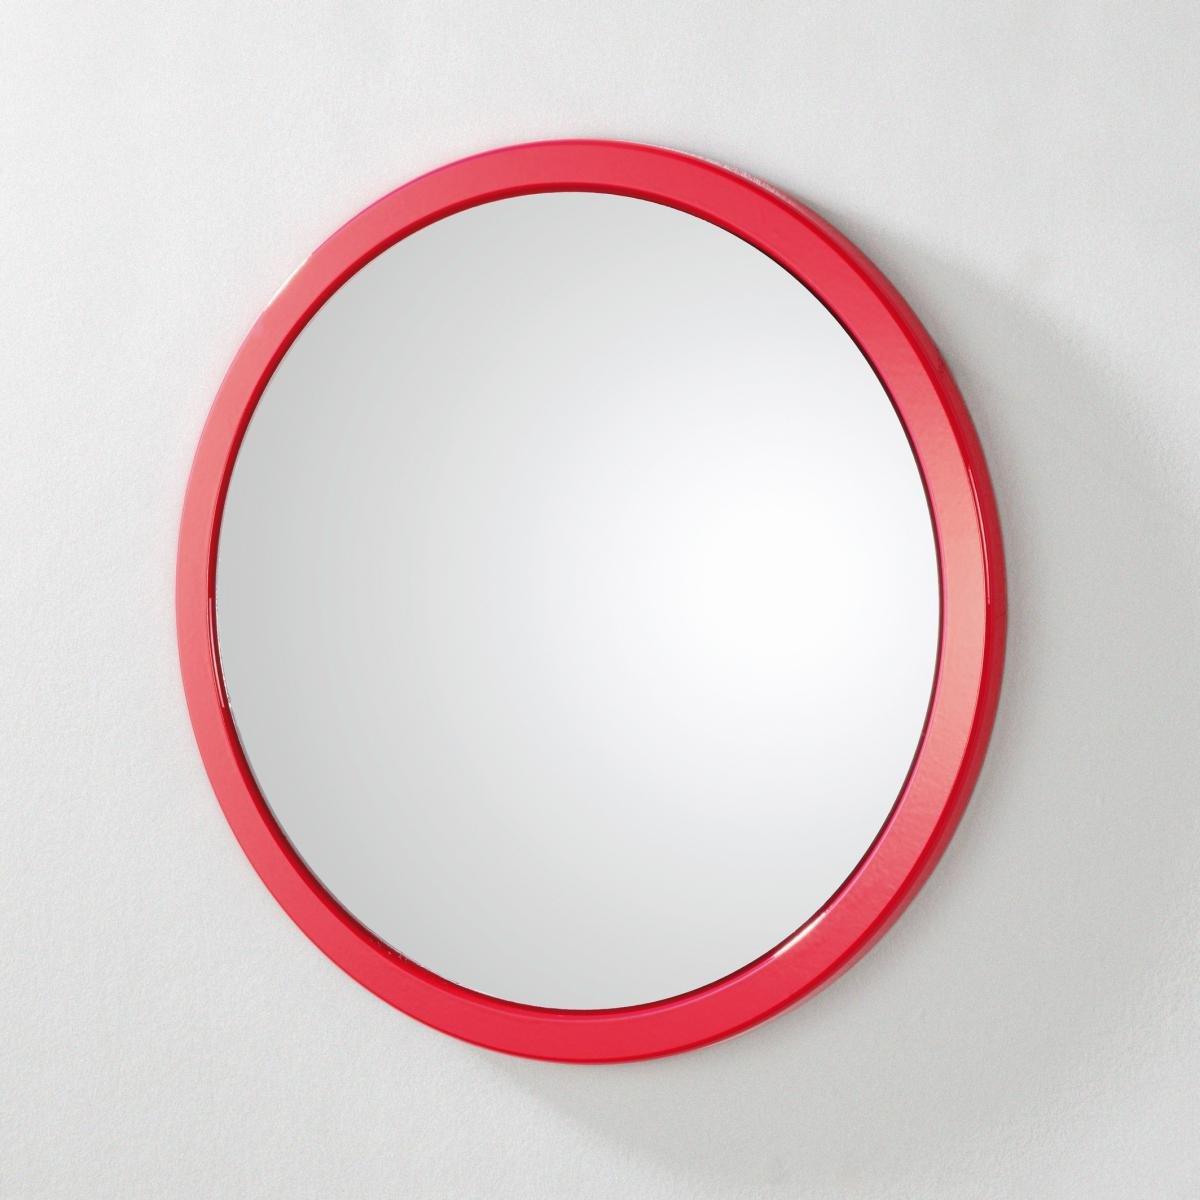 HAKU Furniture 42189 Wall Mirror Depth 2 X 38 Cm Amazoncouk Kitchen Home